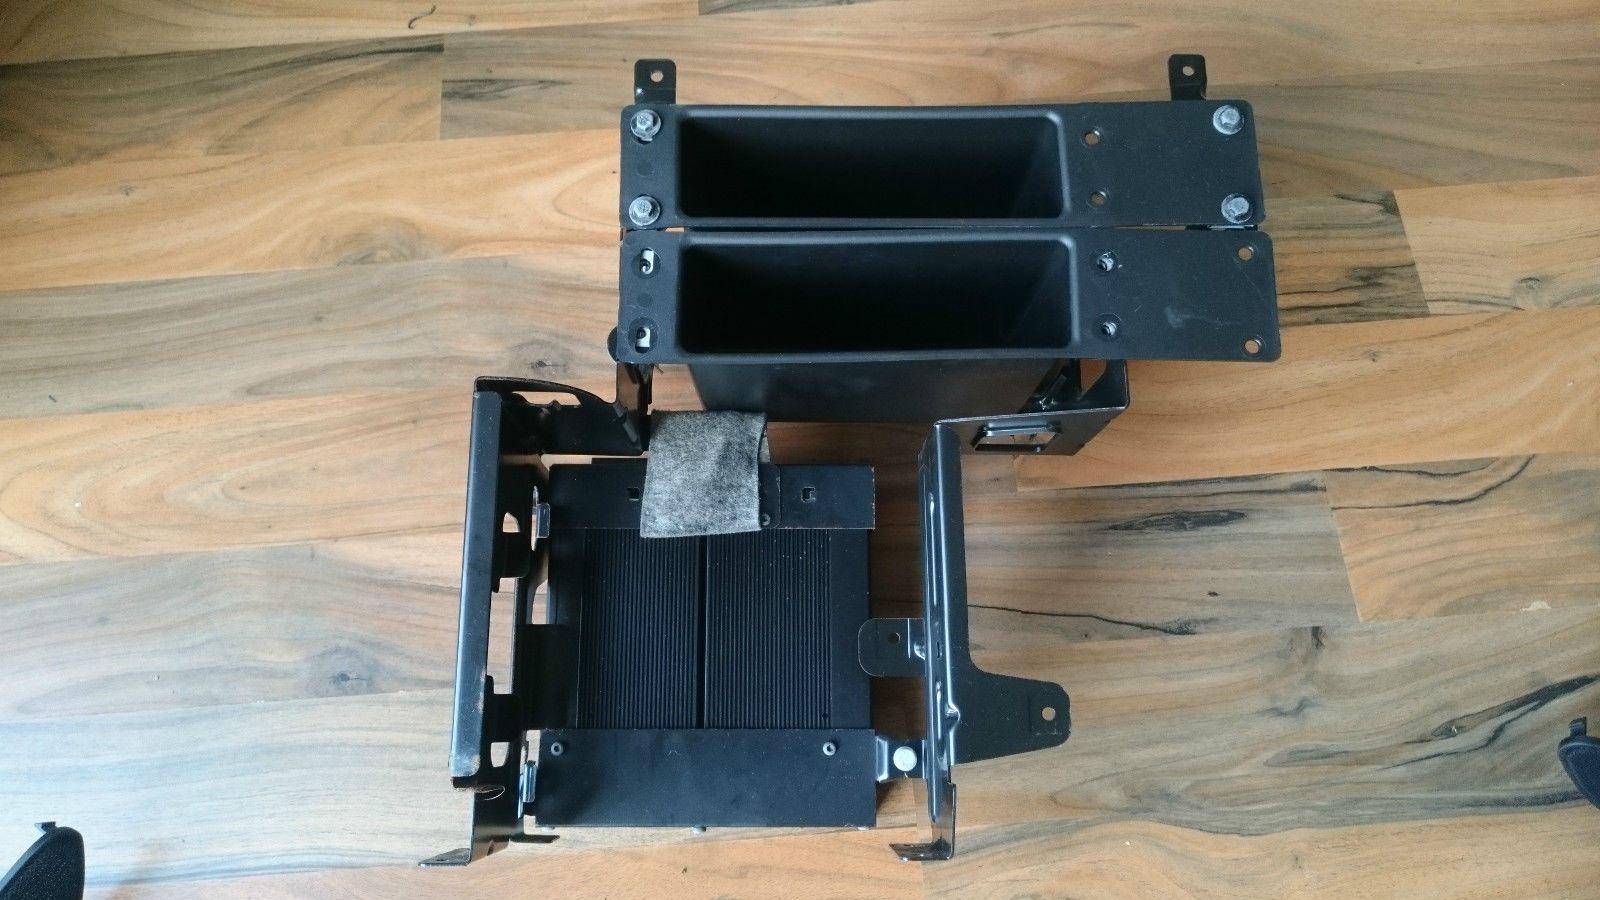 Bmw E46 330 Harman Kardon Speakers Wiring Amplifier Full Kit 10 Sets Ebay Bmw Bmw E46 330 Bmw E46